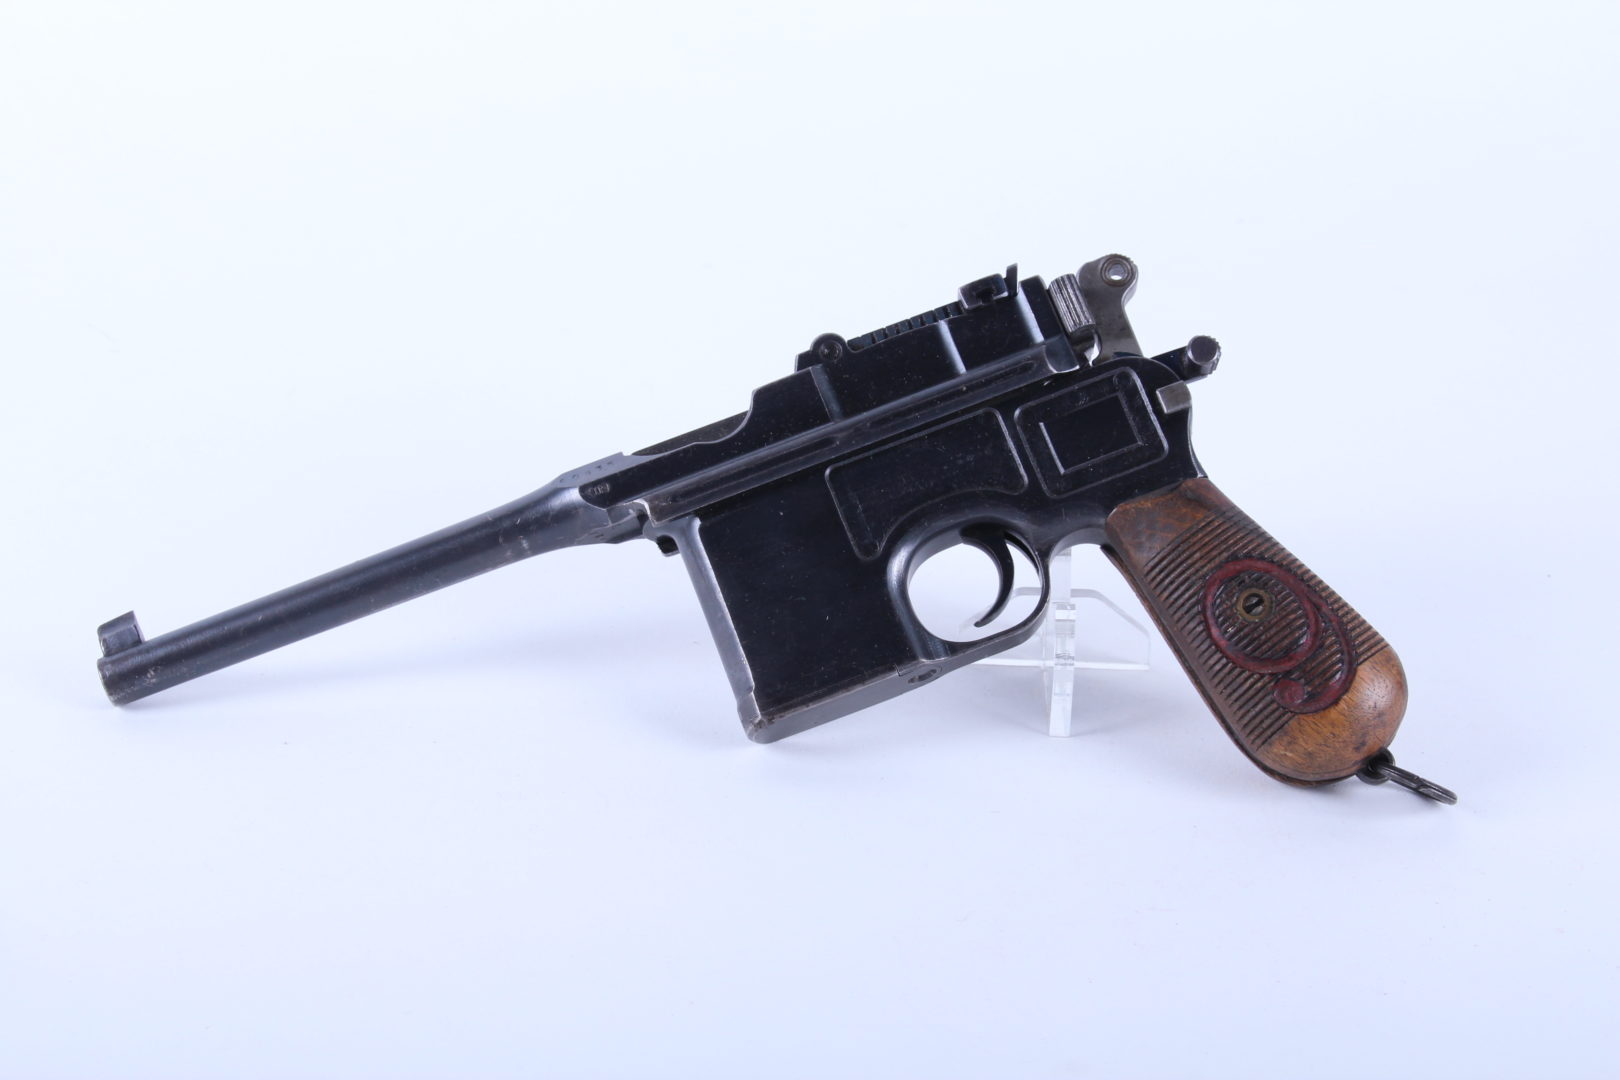 pistolet c96 9mm catégorie b aiolfi g b r